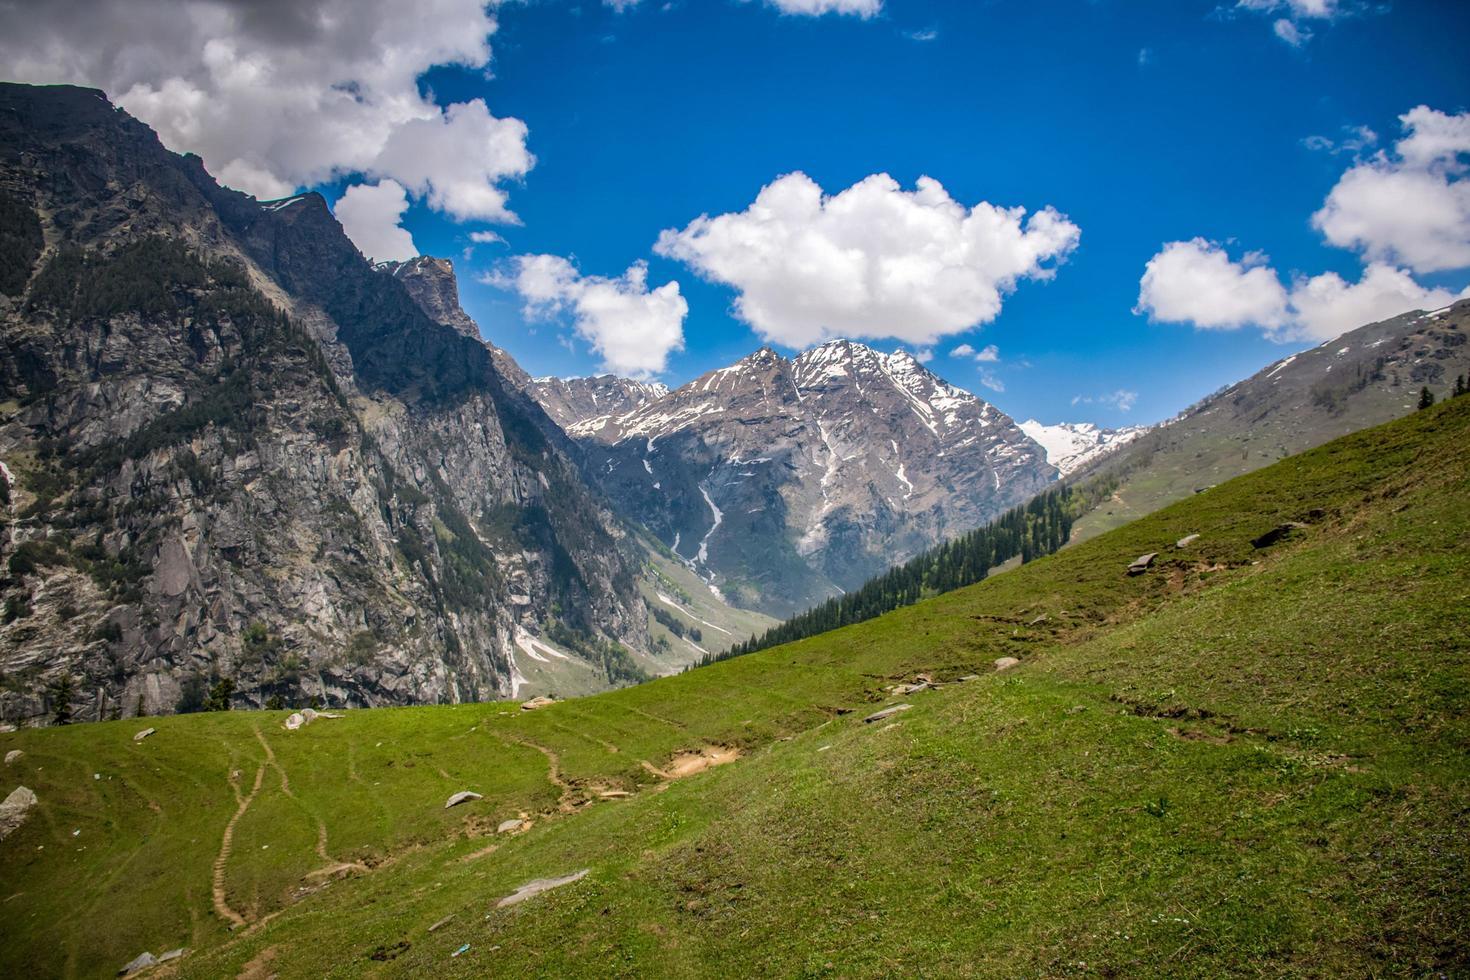 Landschaftsfoto der Berge foto